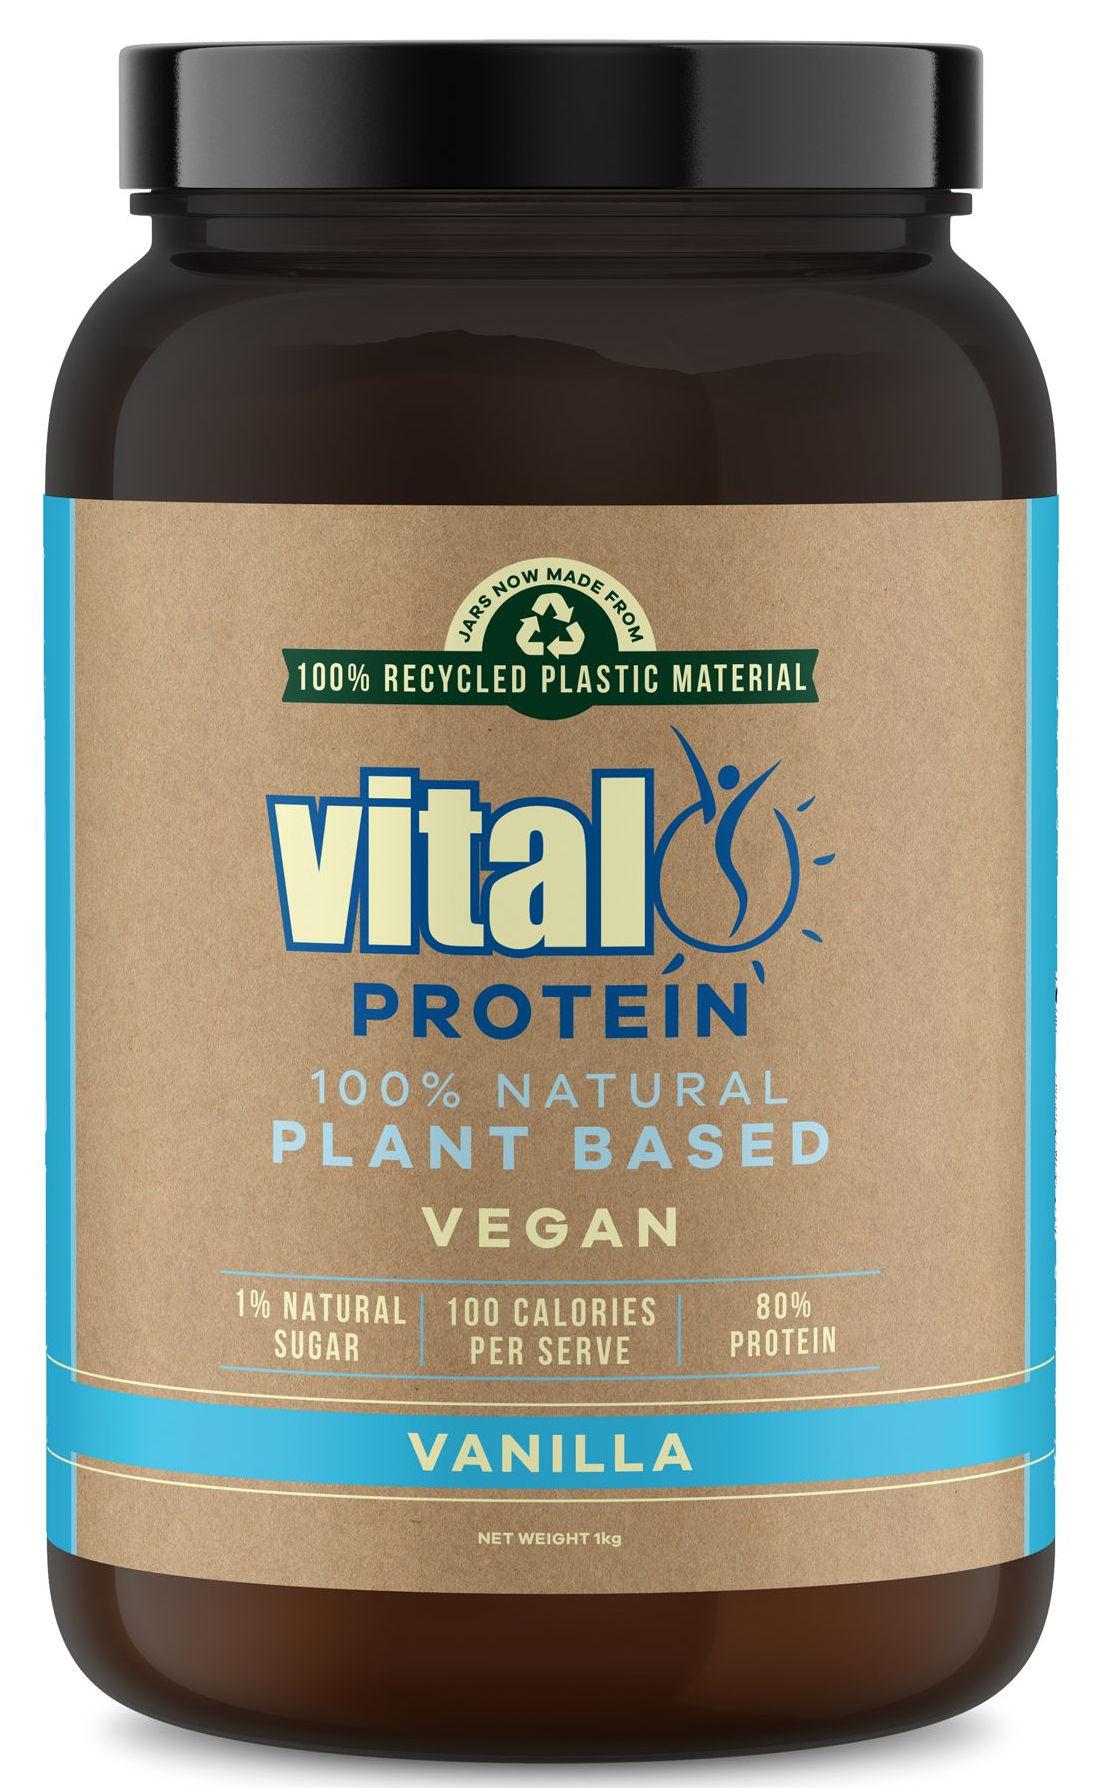 Vital Protein 1kg - Vanilla Pea Protein